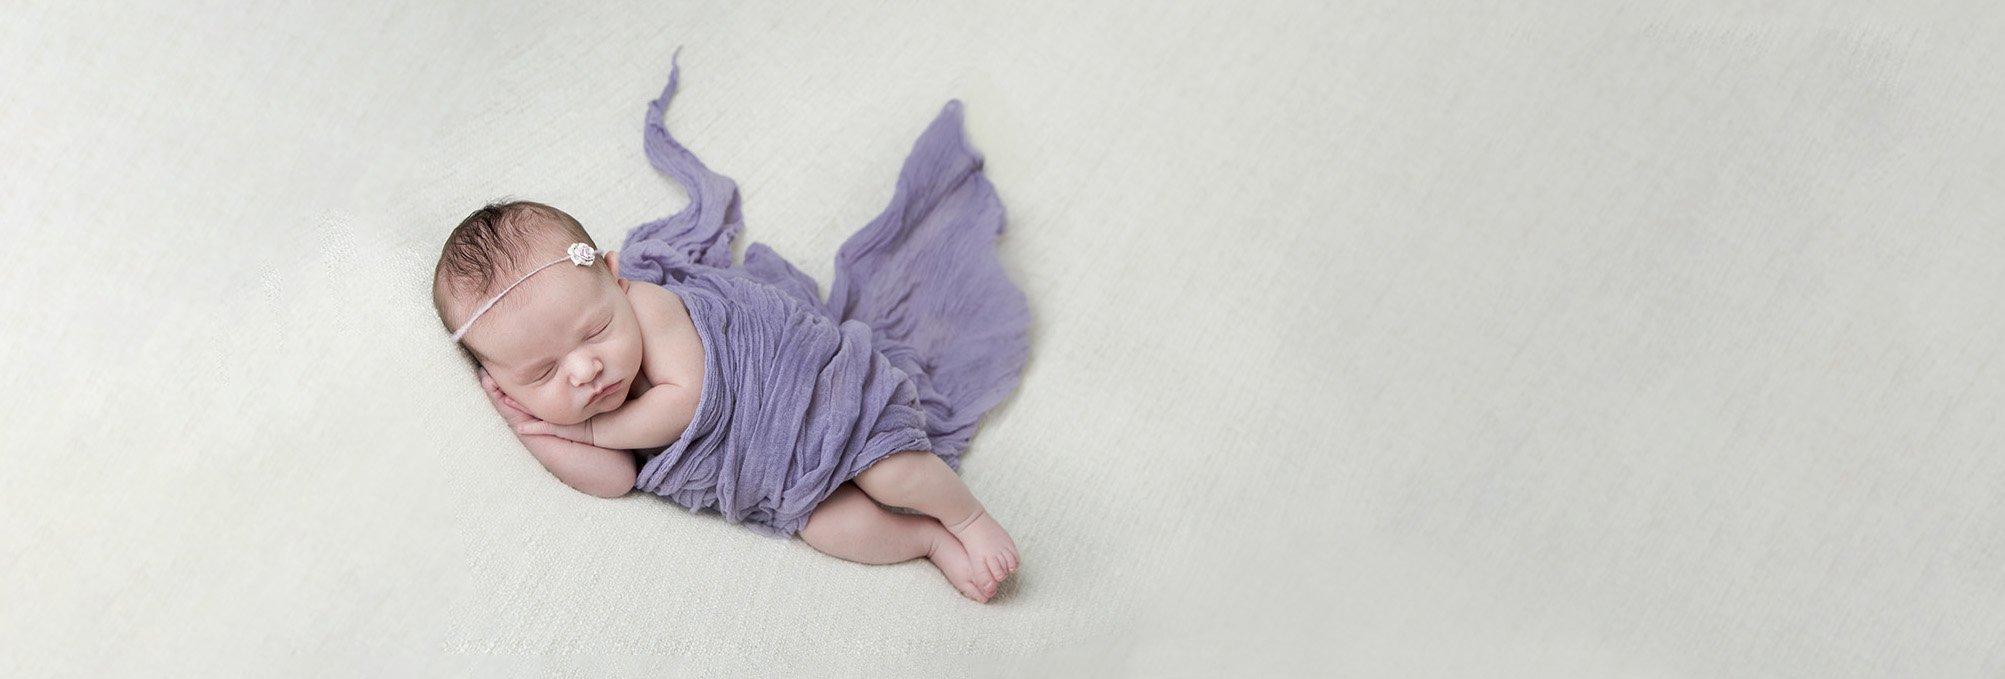 newborn_photography_melbourne